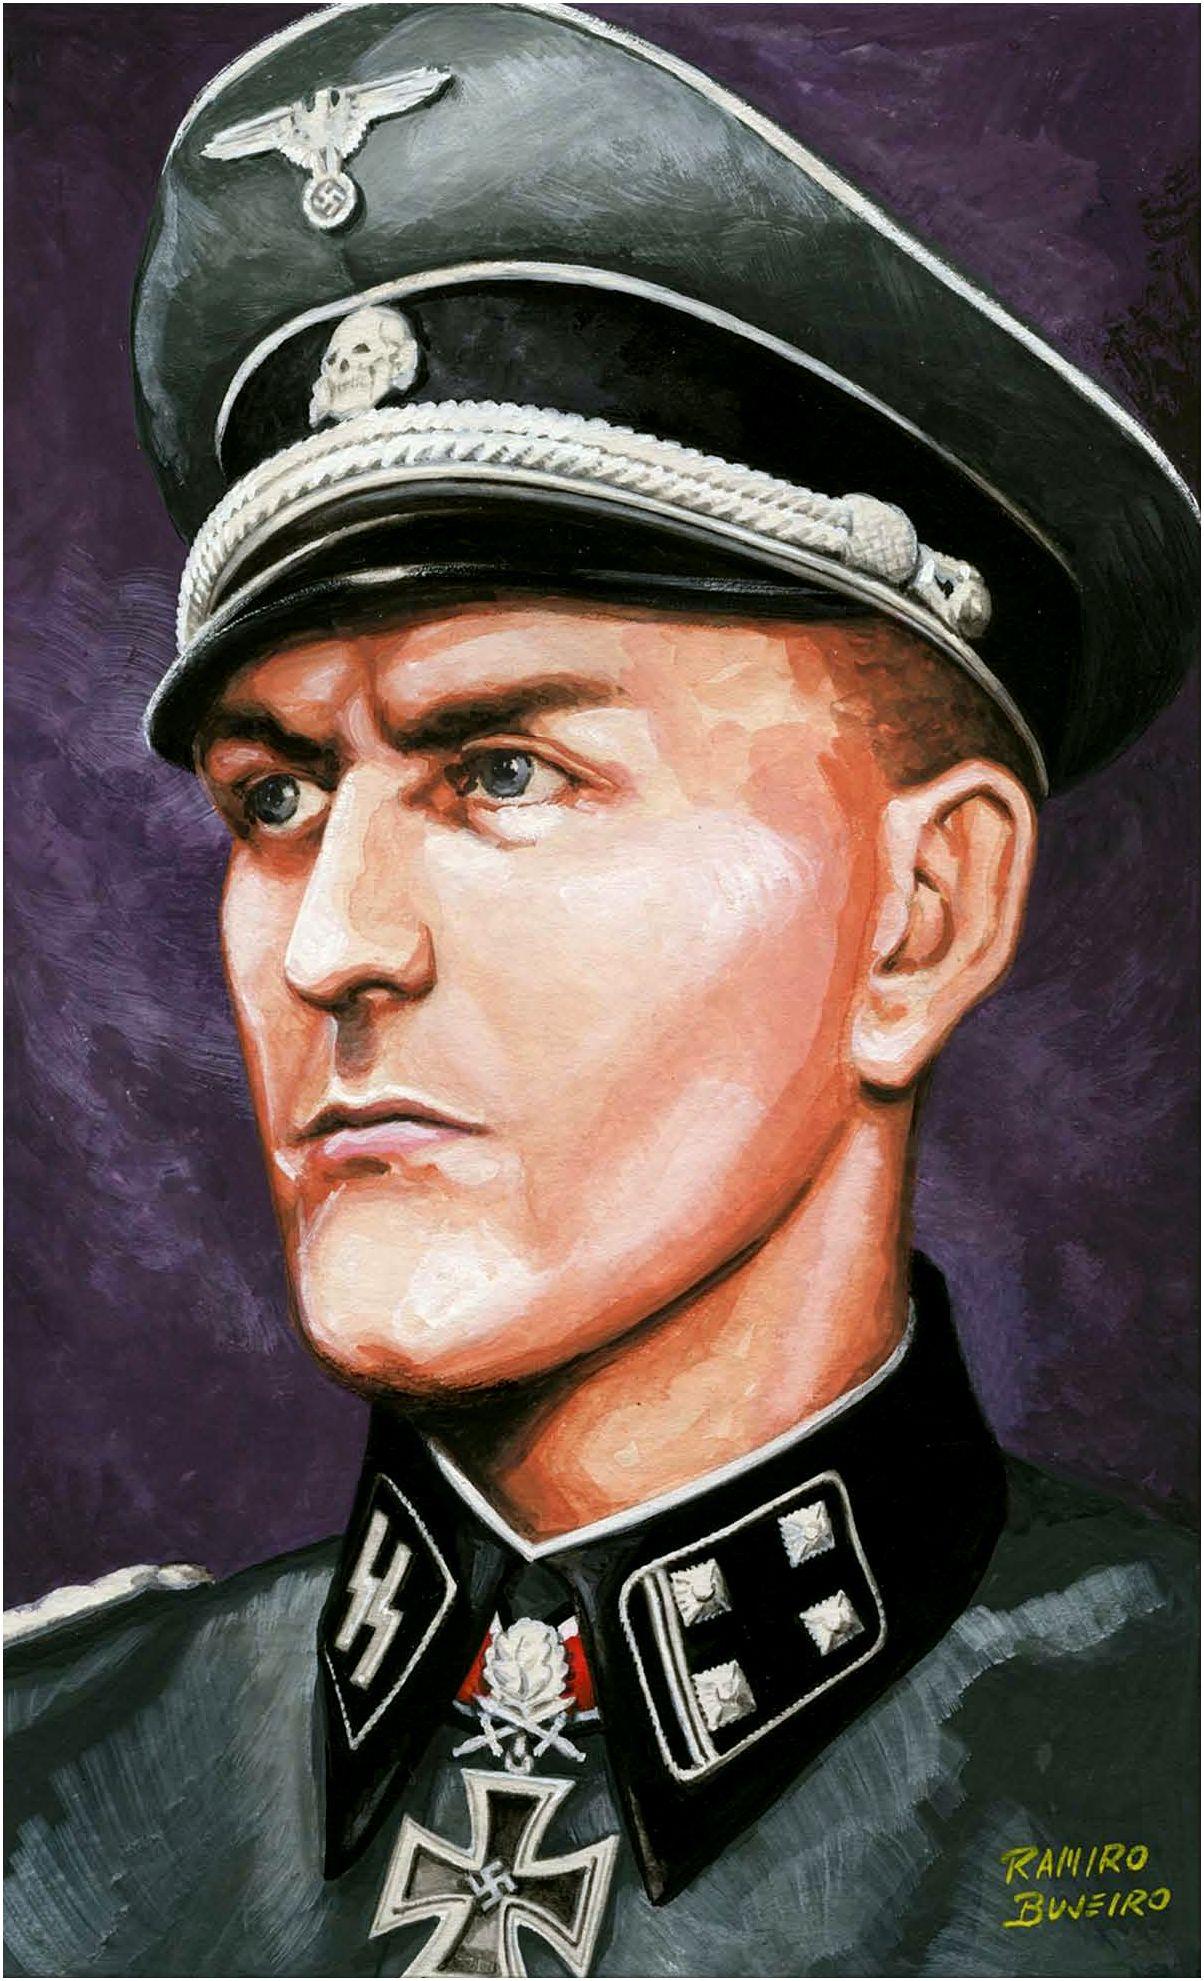 Bujeiro Ramiro. Подполковник Hans Dorr.